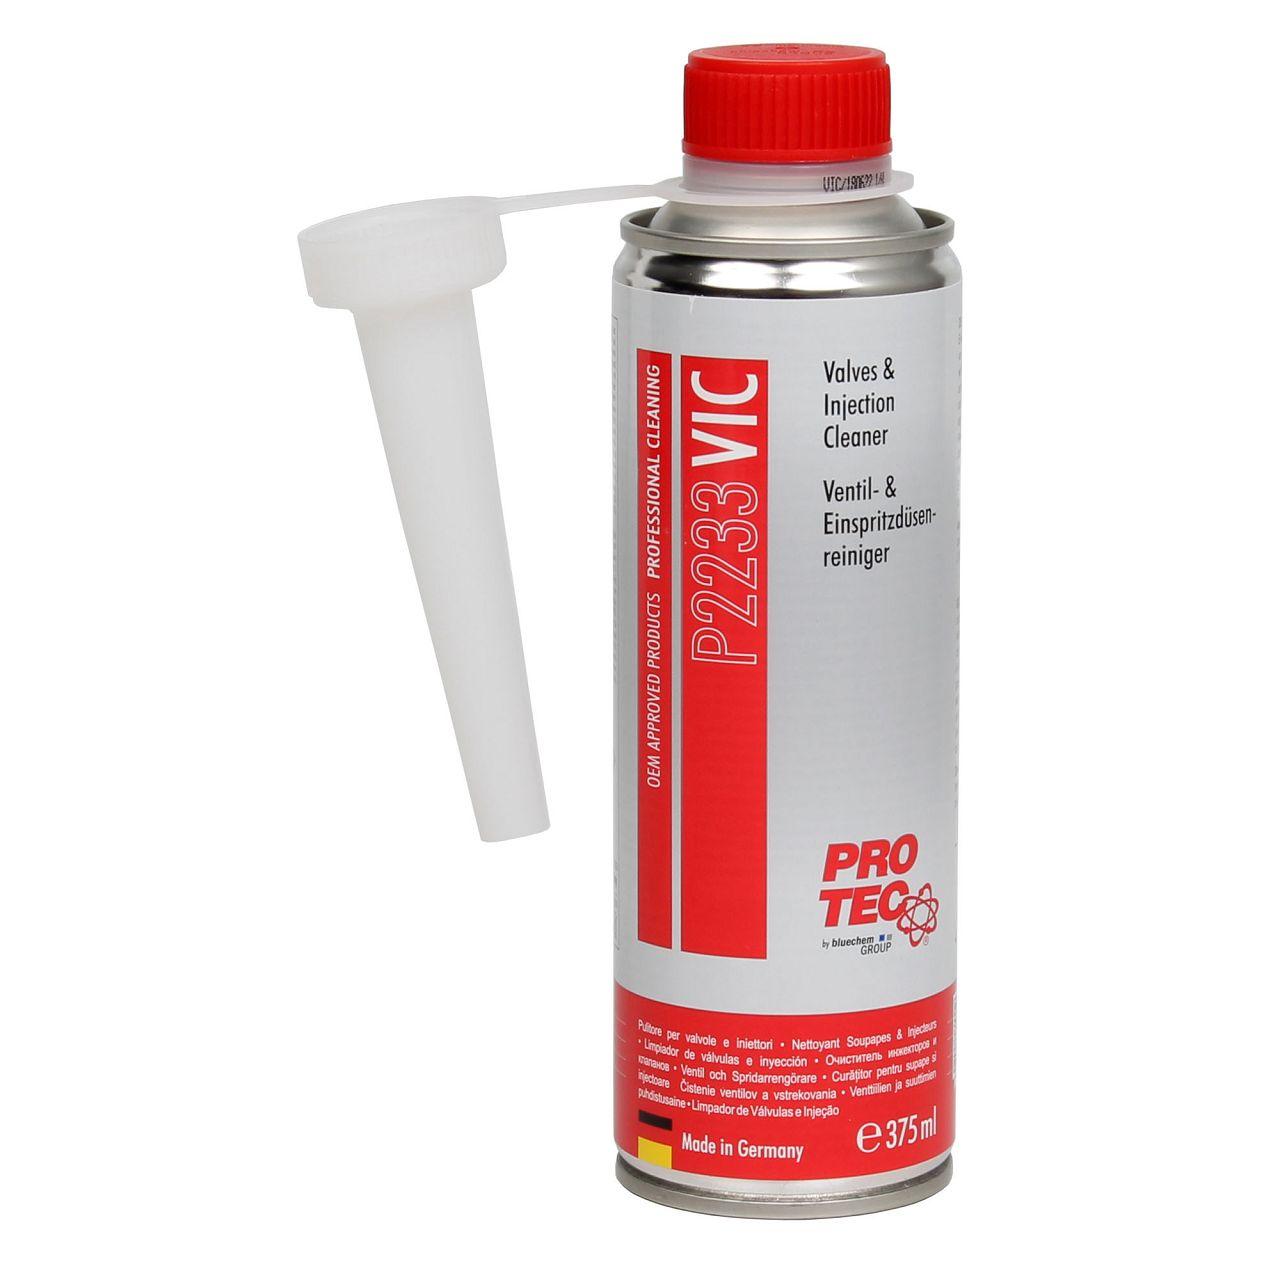 PROTEC VIC Valves & Injection Cleaner Ventil- & Einspritzdüsenreiniger 375ml